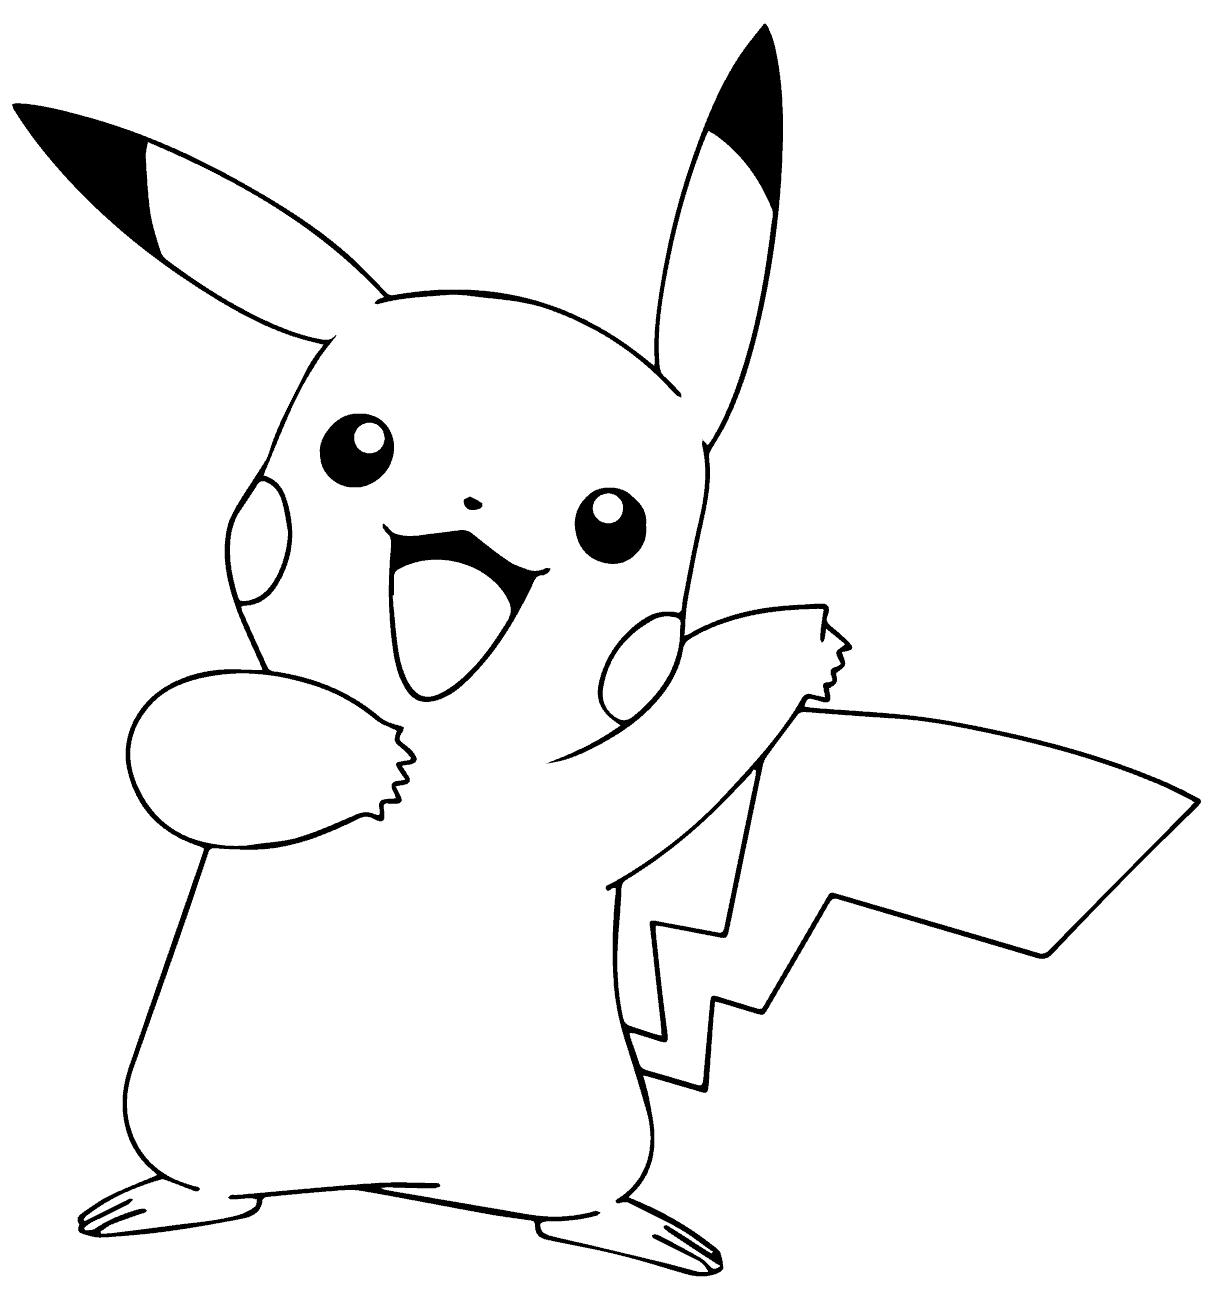 desenhos-para-colorir-do-pokemon-26